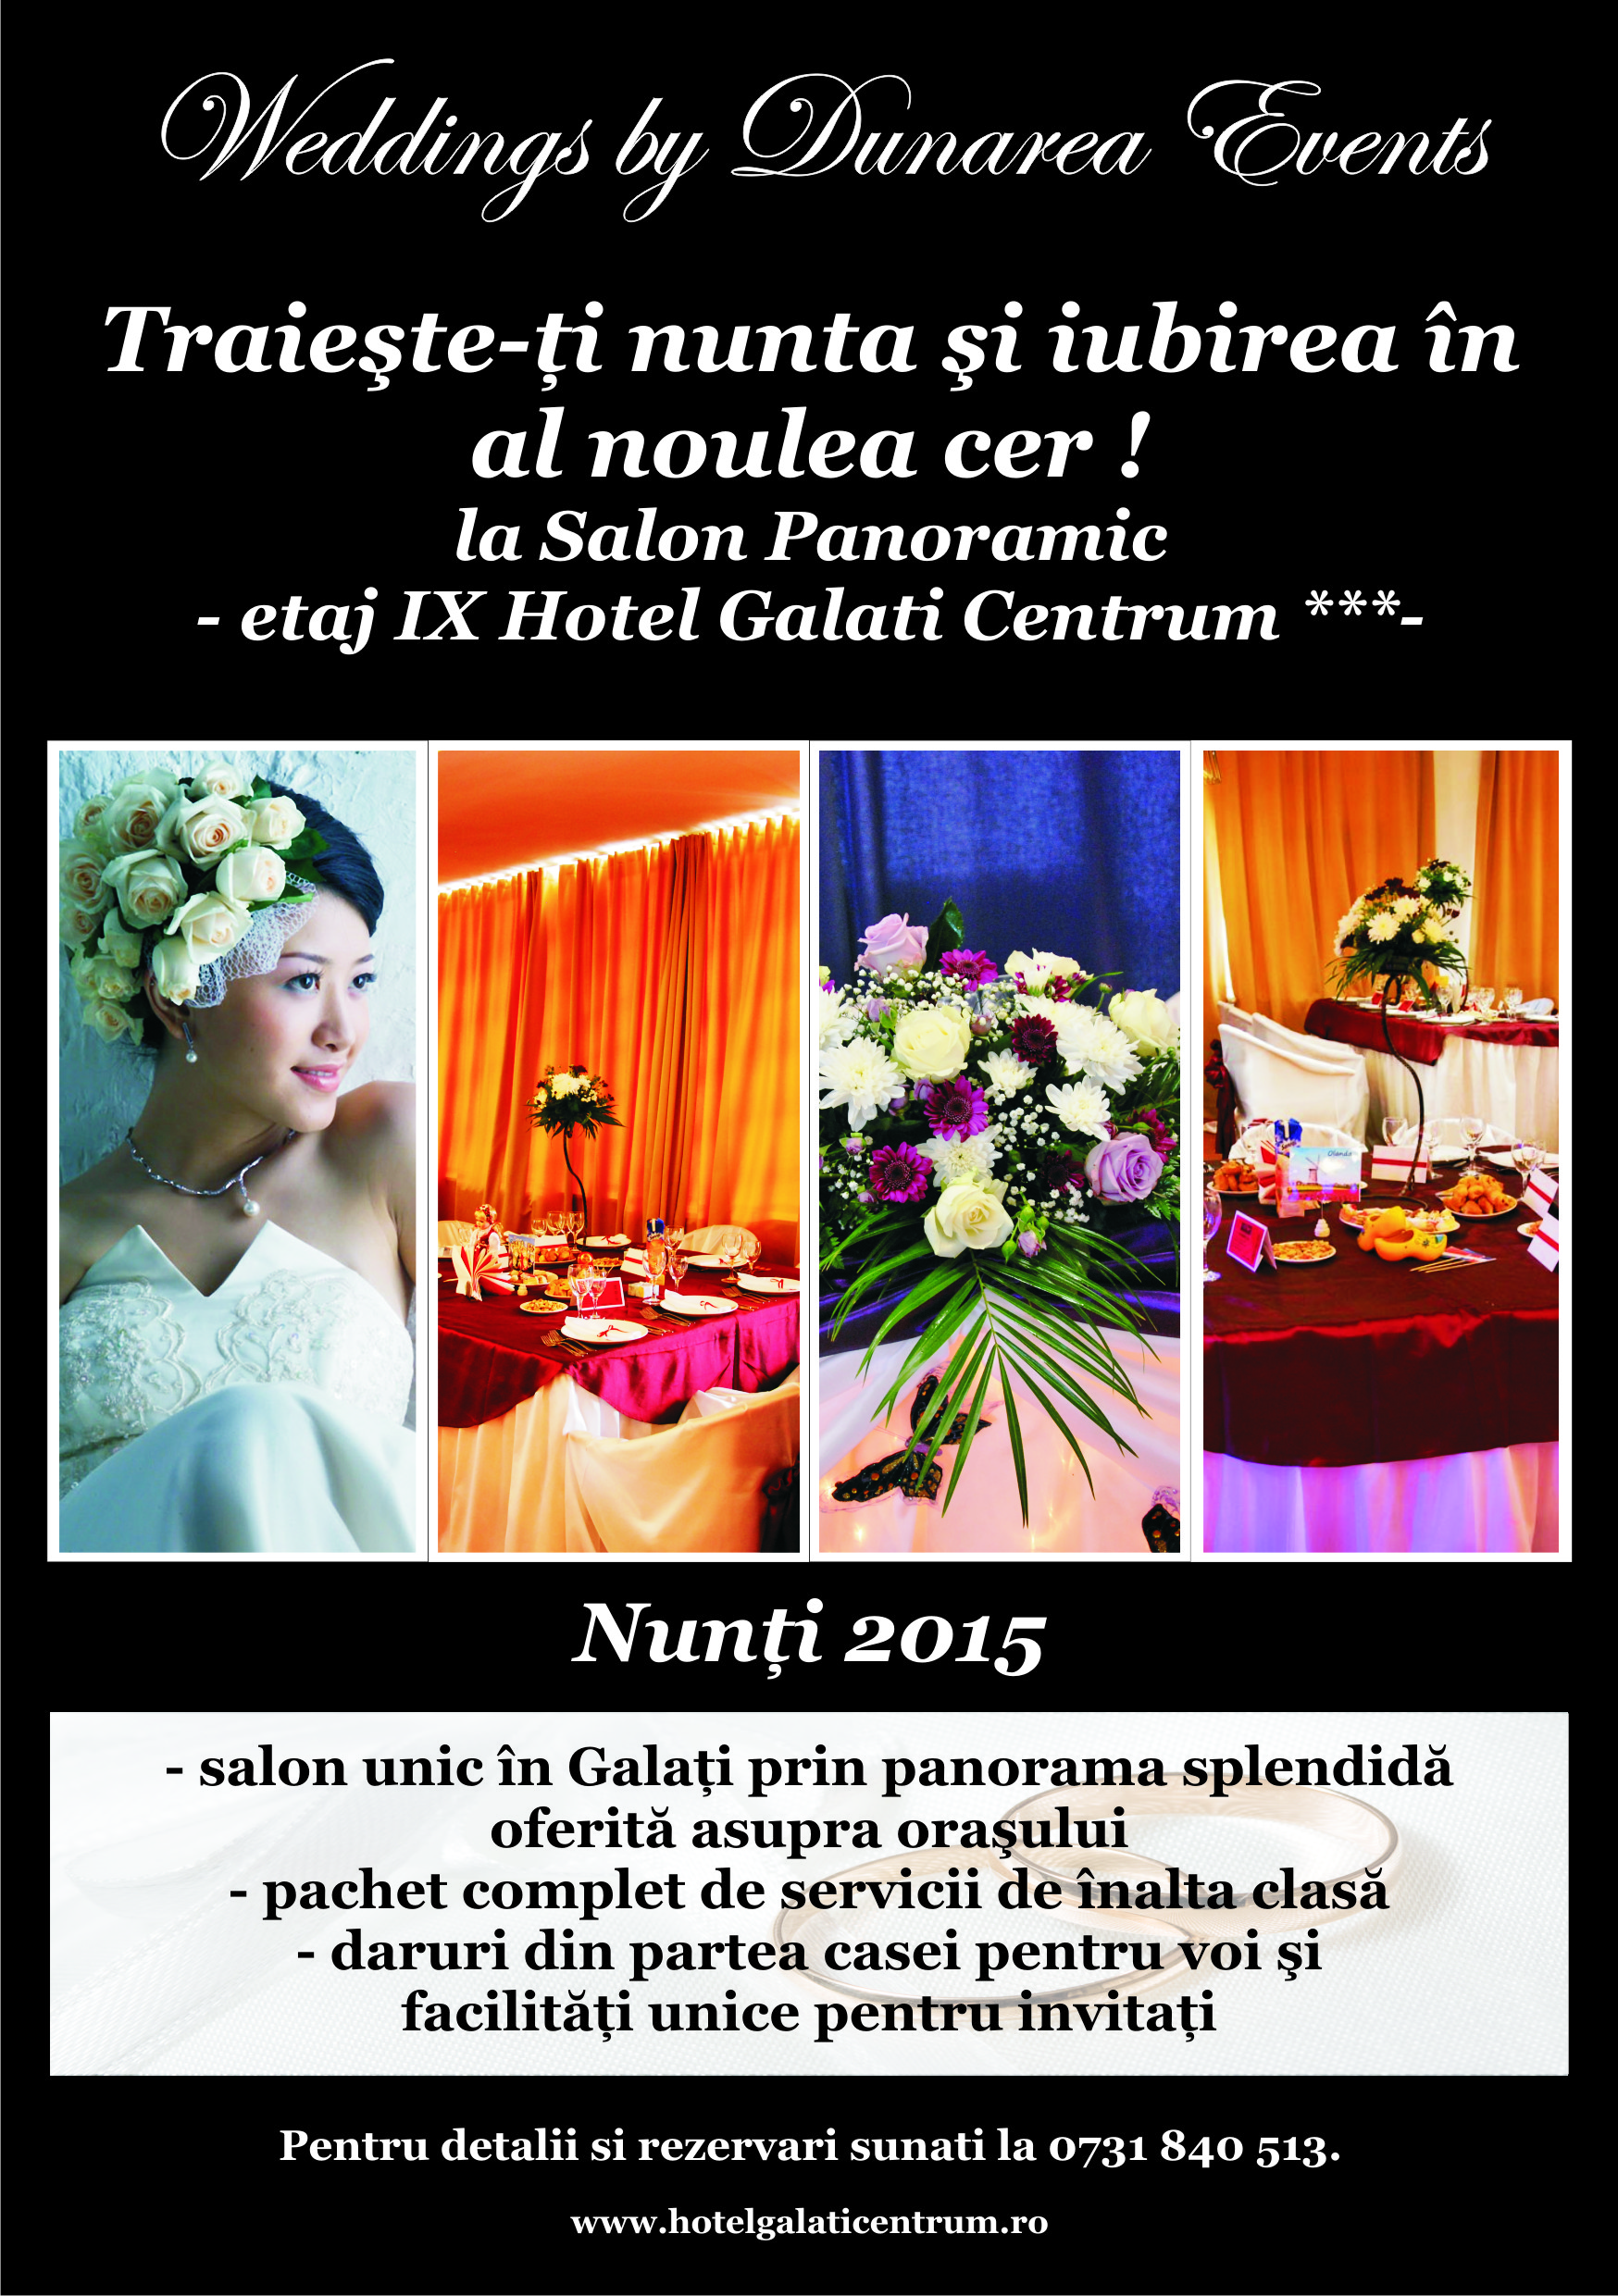 Oferta Nunta Galati   Nunta de vis   nunta galati